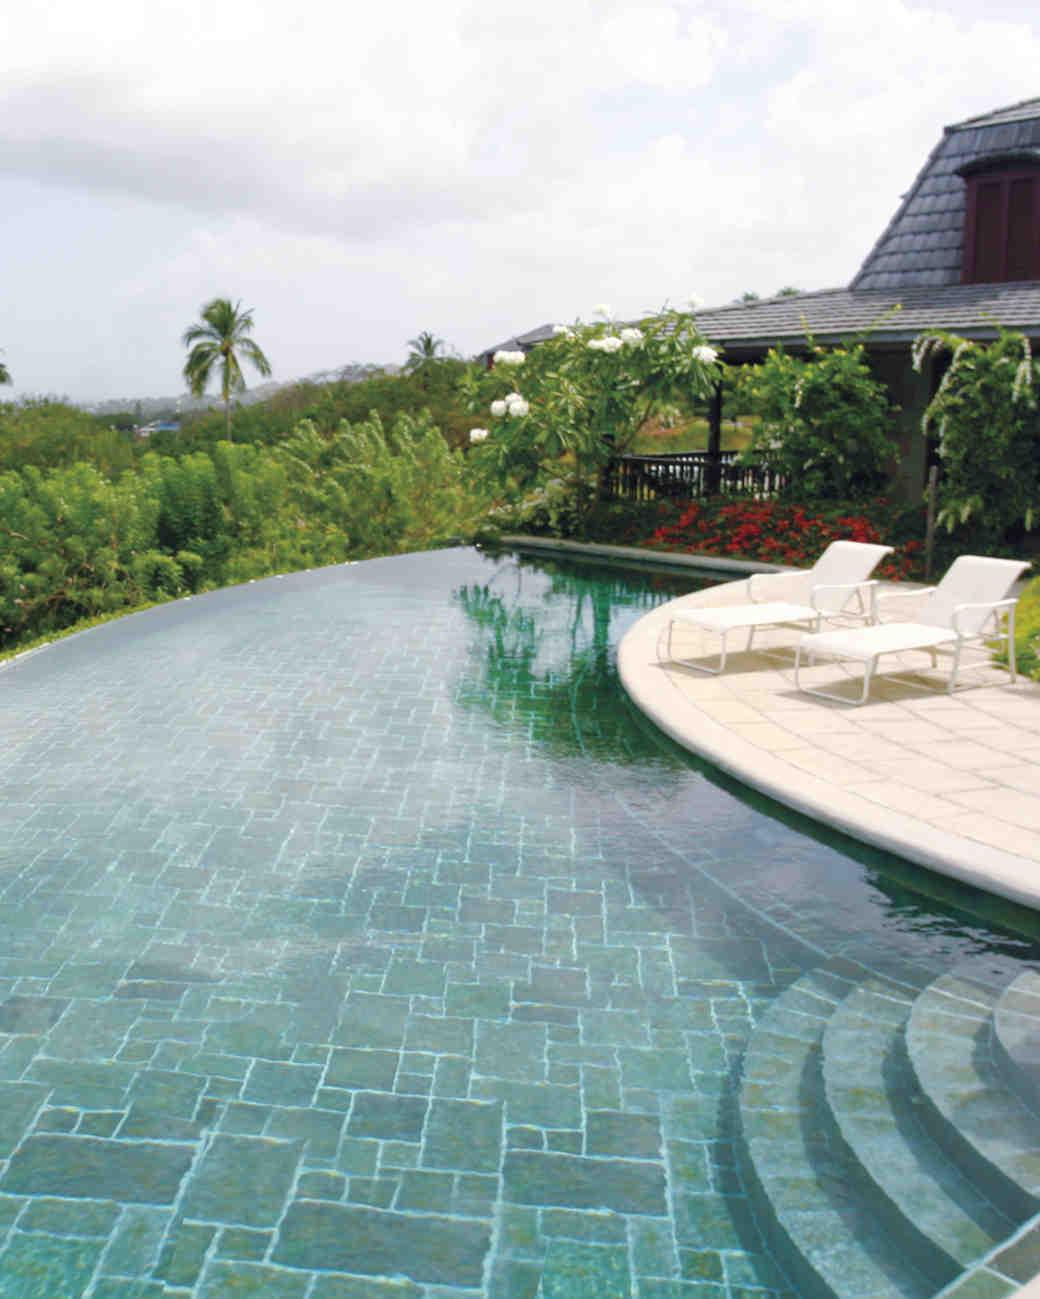 1clubhouse-pool-mwds109229.jpg